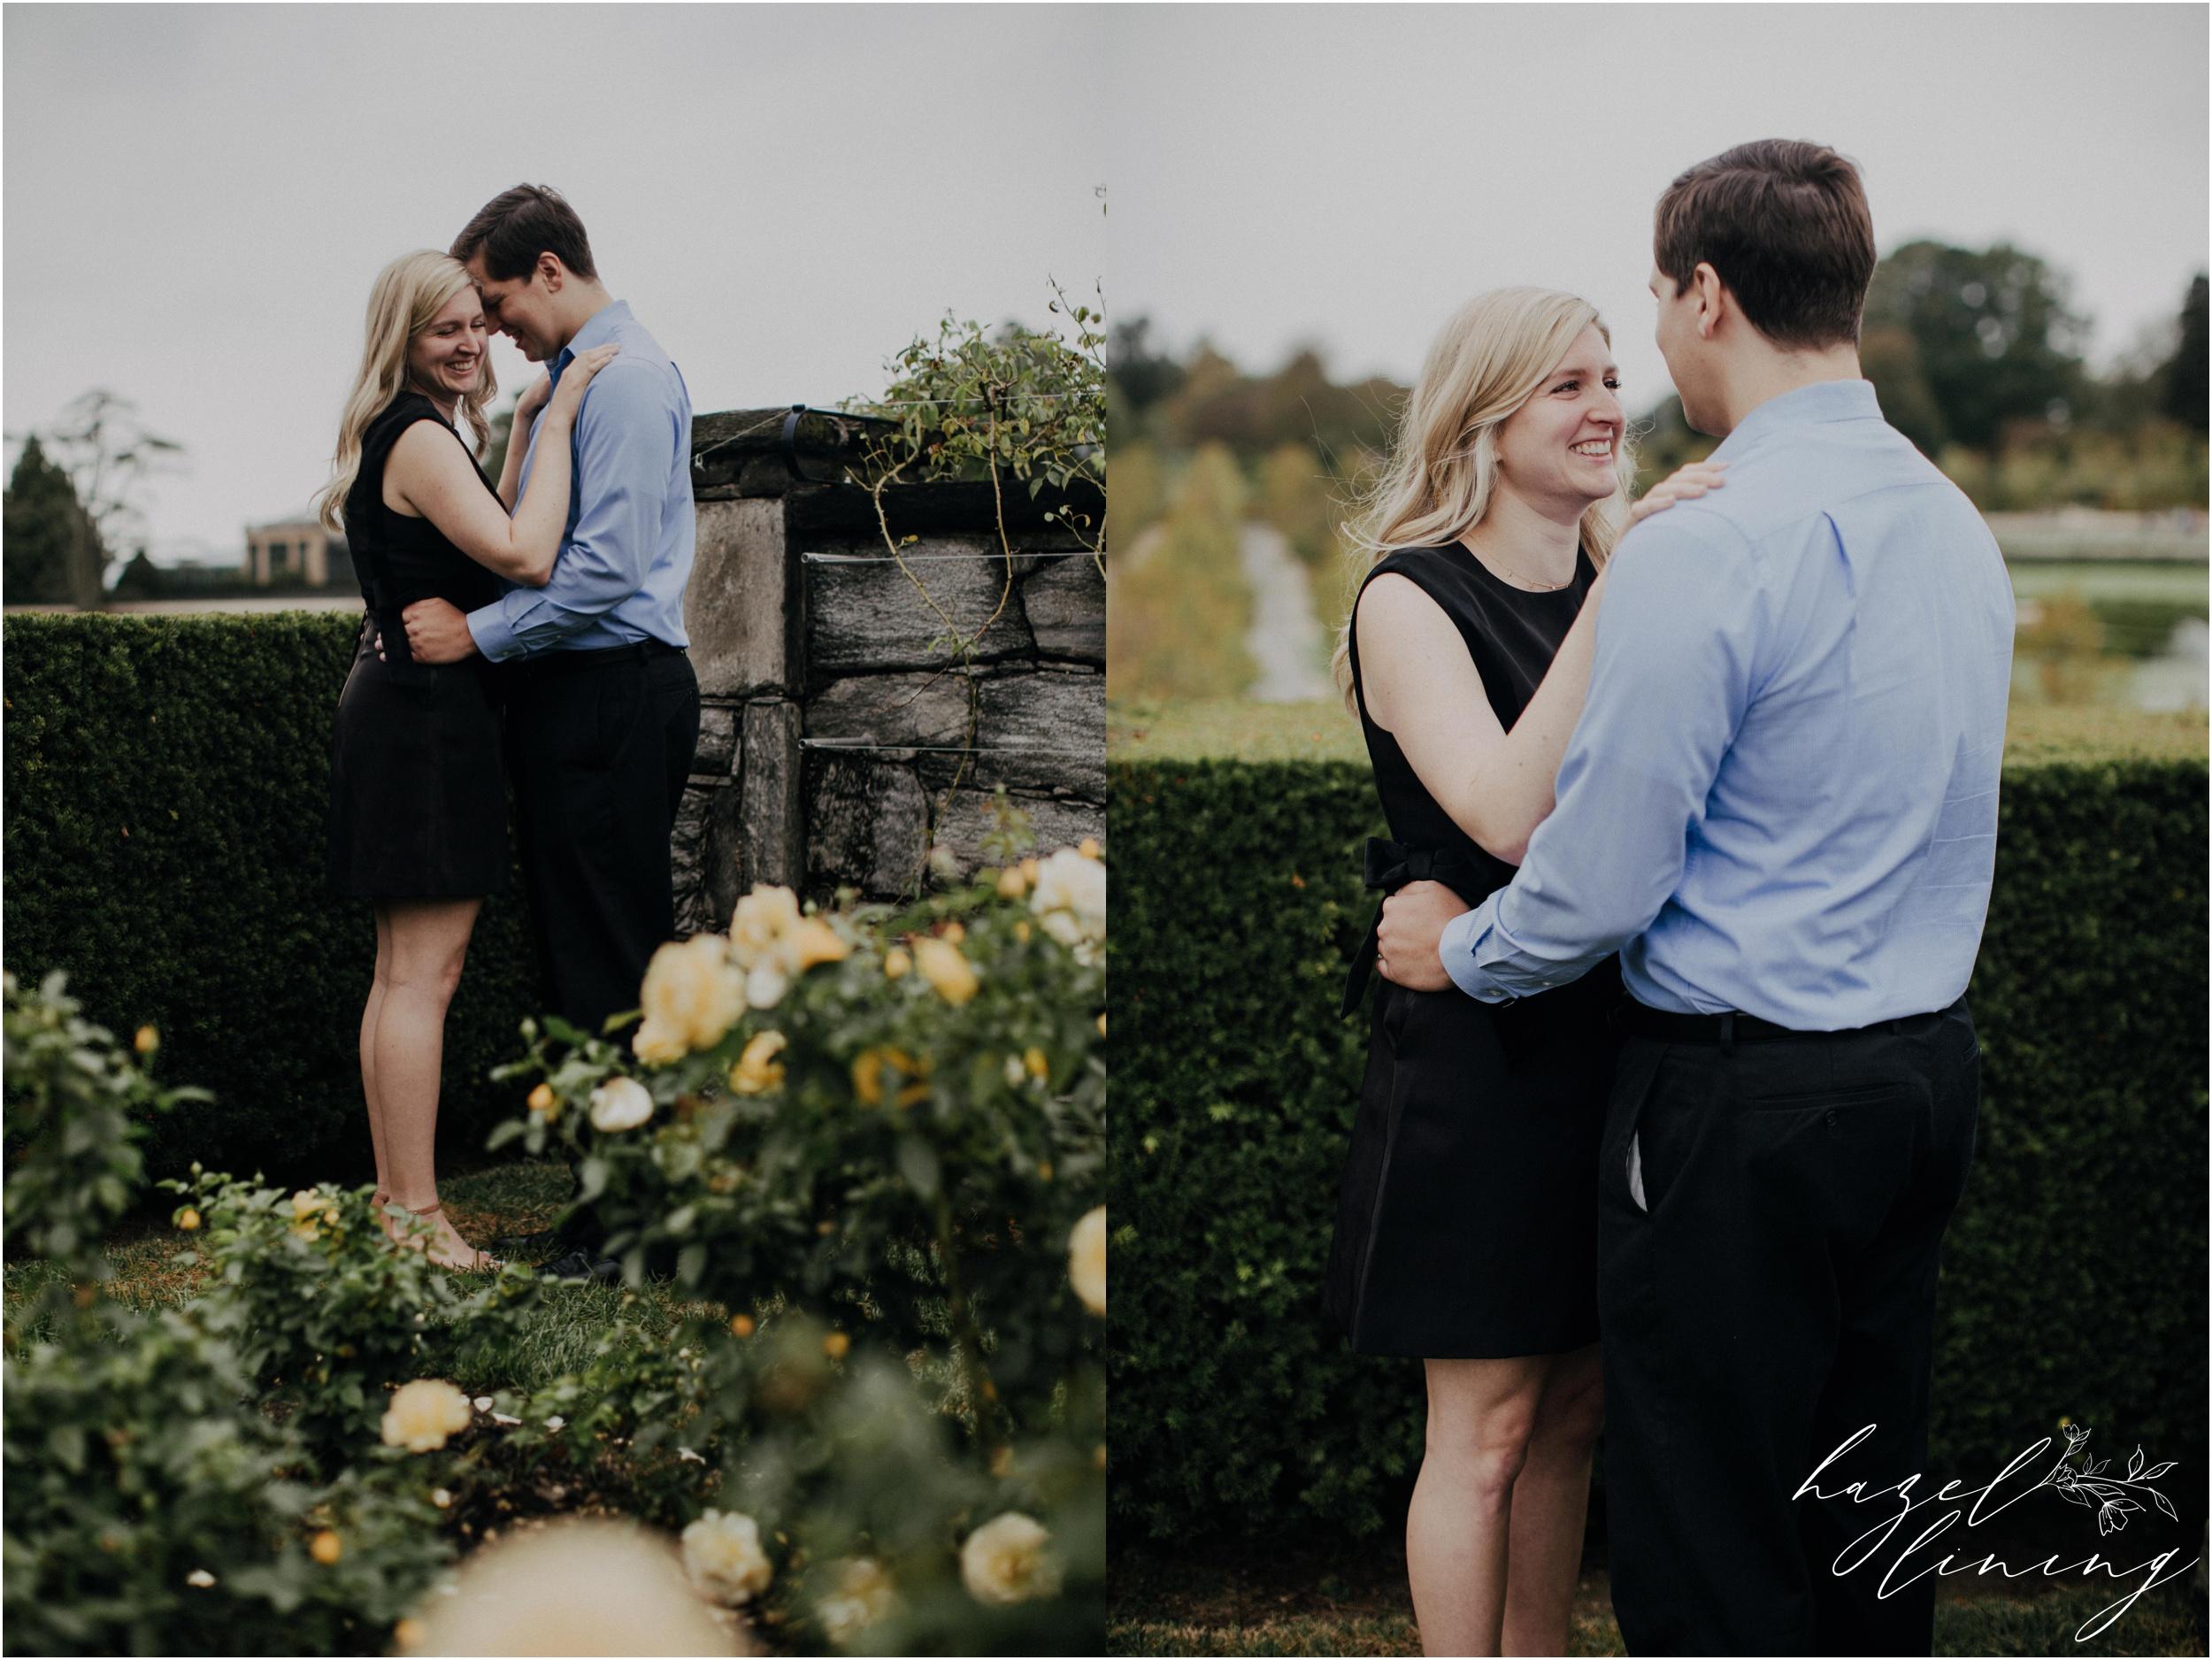 victoria-travis-logan-mayes-longwood-gardens-kennett-square-philadelphia-engagement-session-hazel-lining-photography-destination-elopement-wedding-engagement-photography_0009.jpg